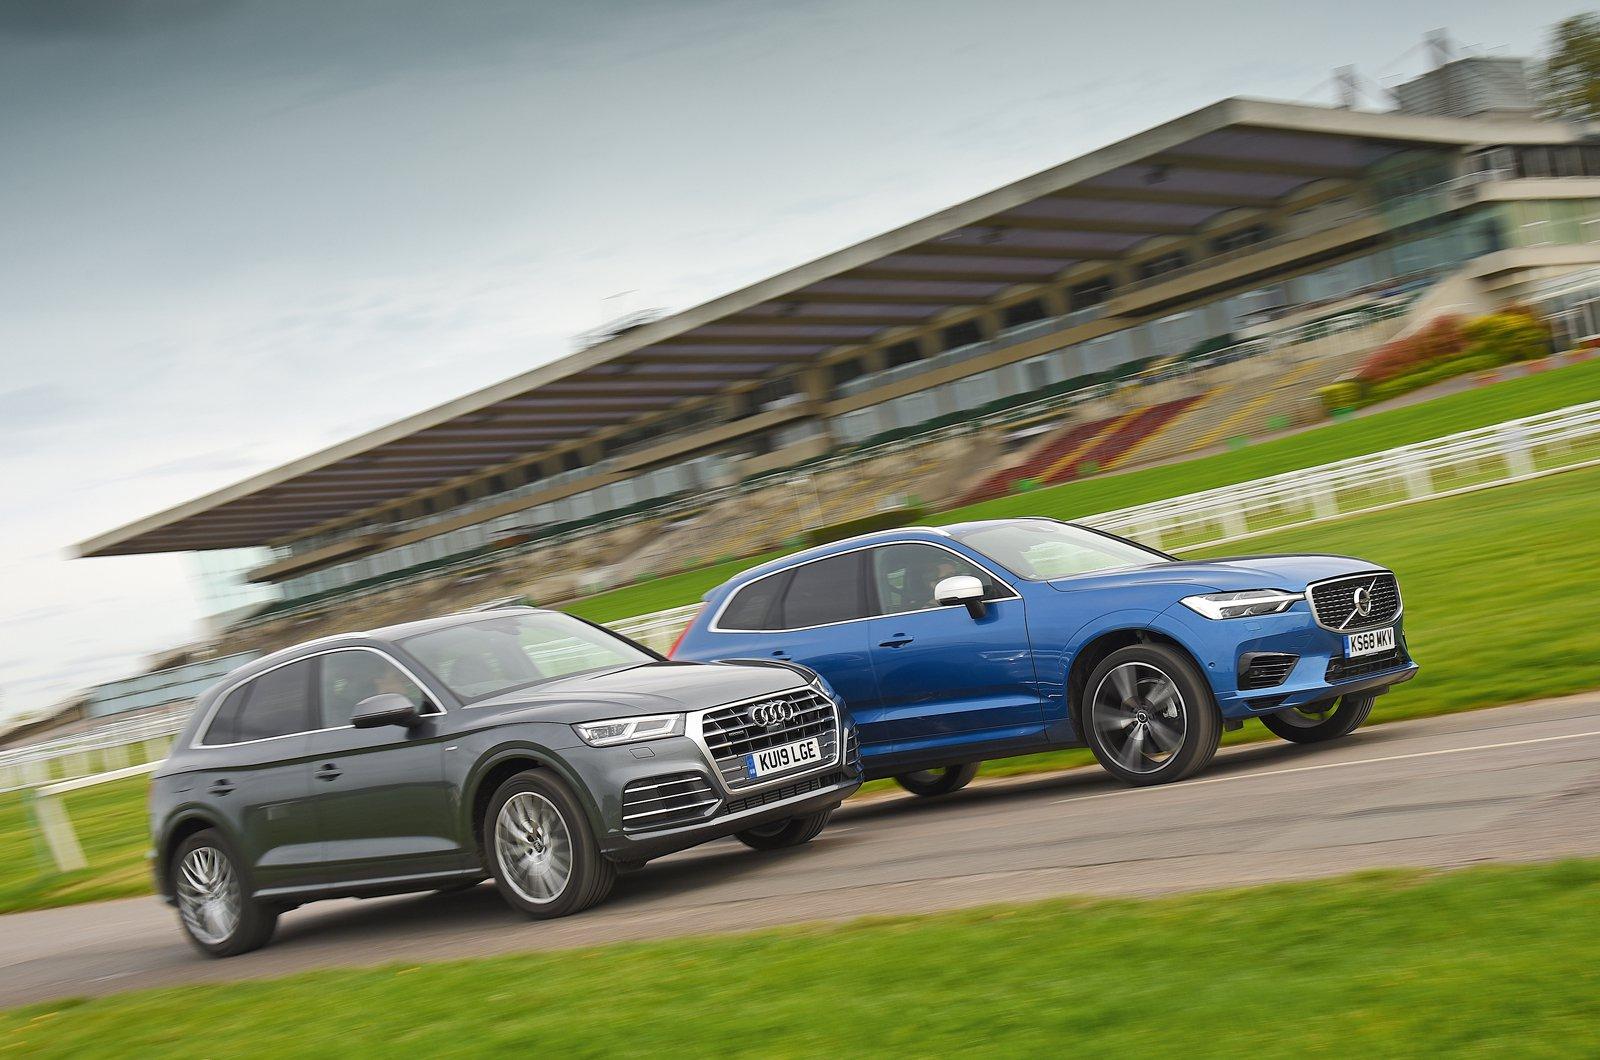 Audi Q5 diesel (19 plate) vs Volvo XC60 hybrid (68 plate)